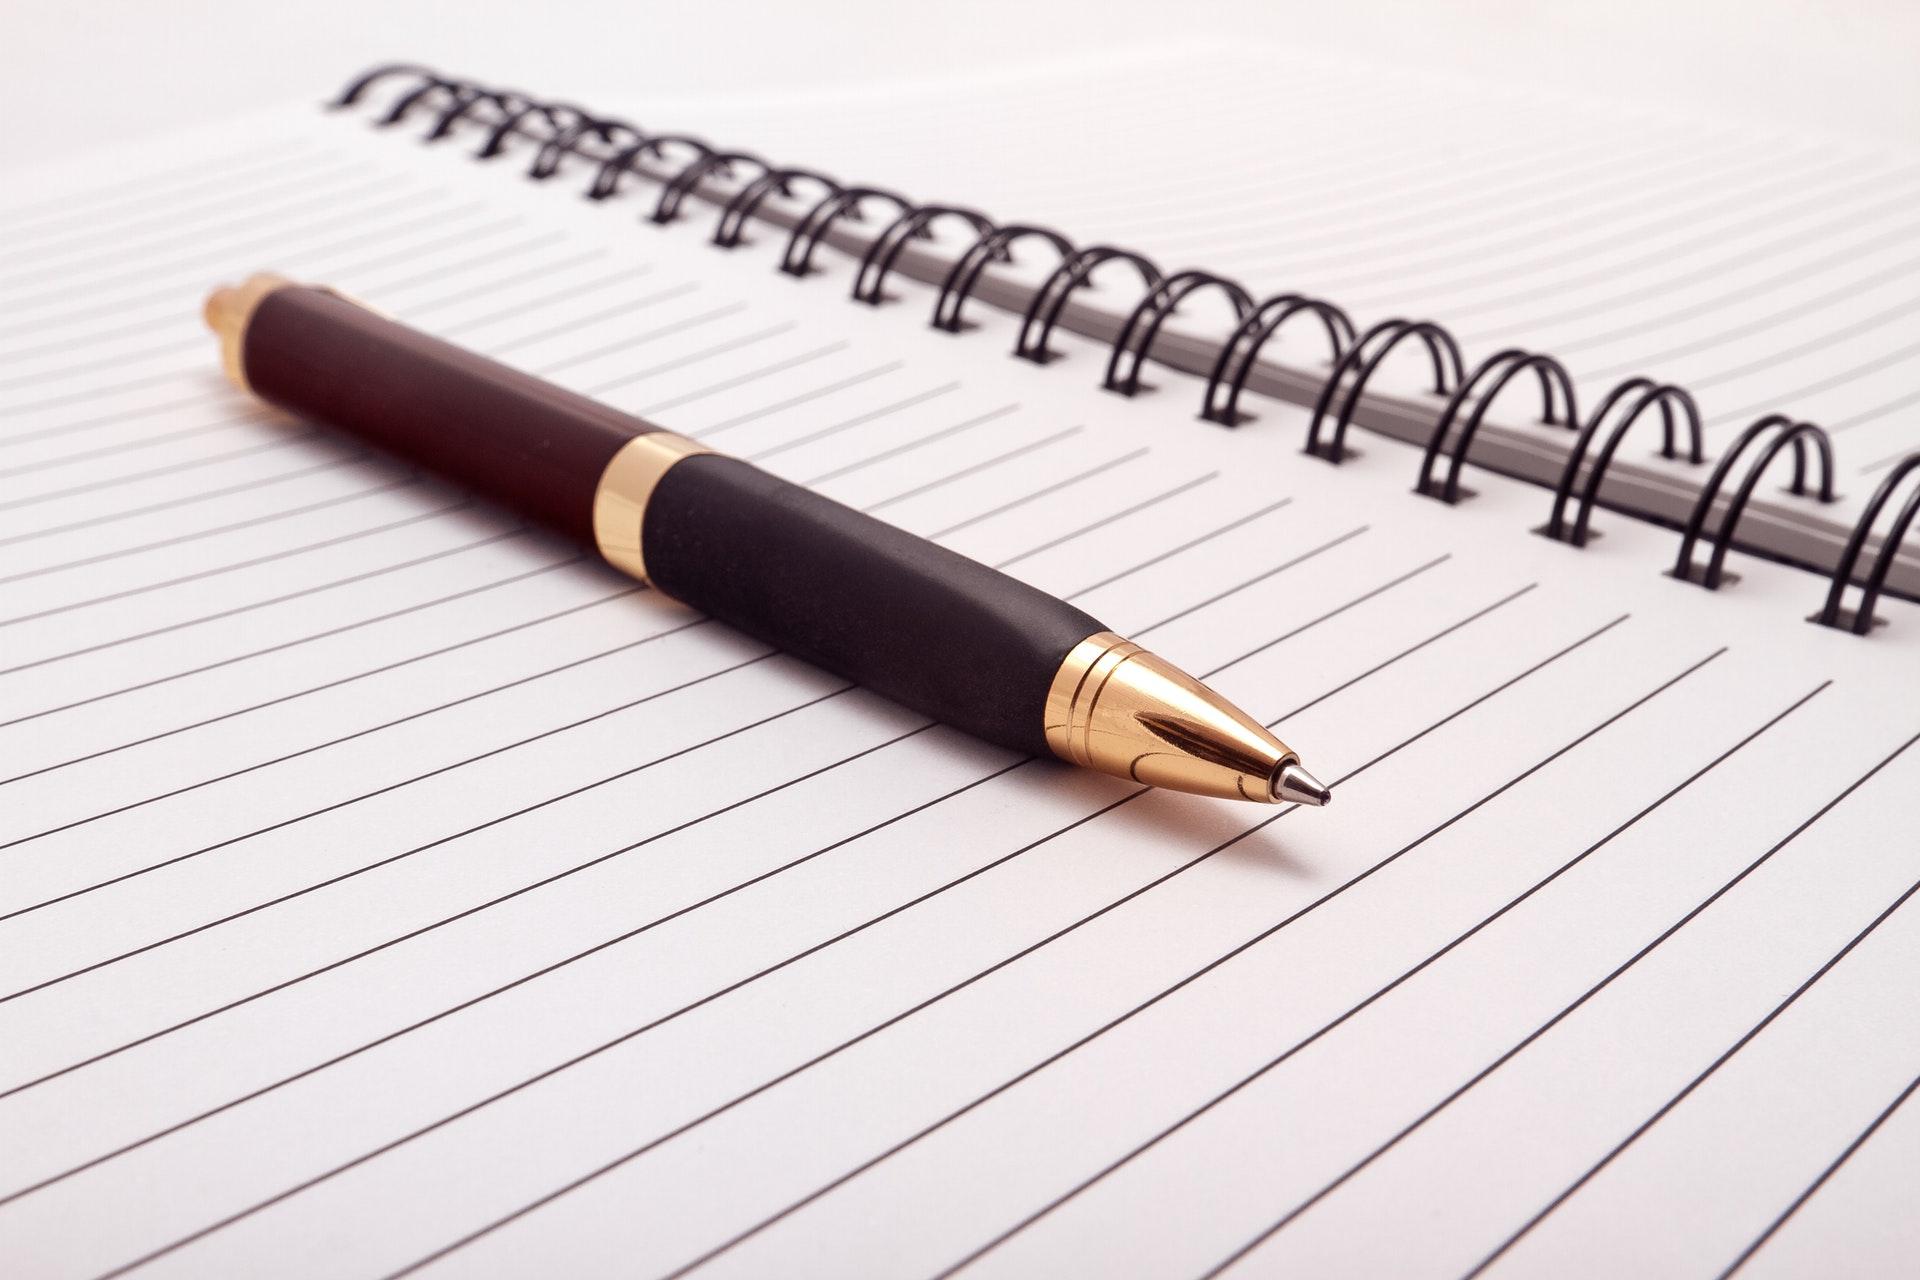 Sample Statement of Purpose for Graduate School - EssayEdge